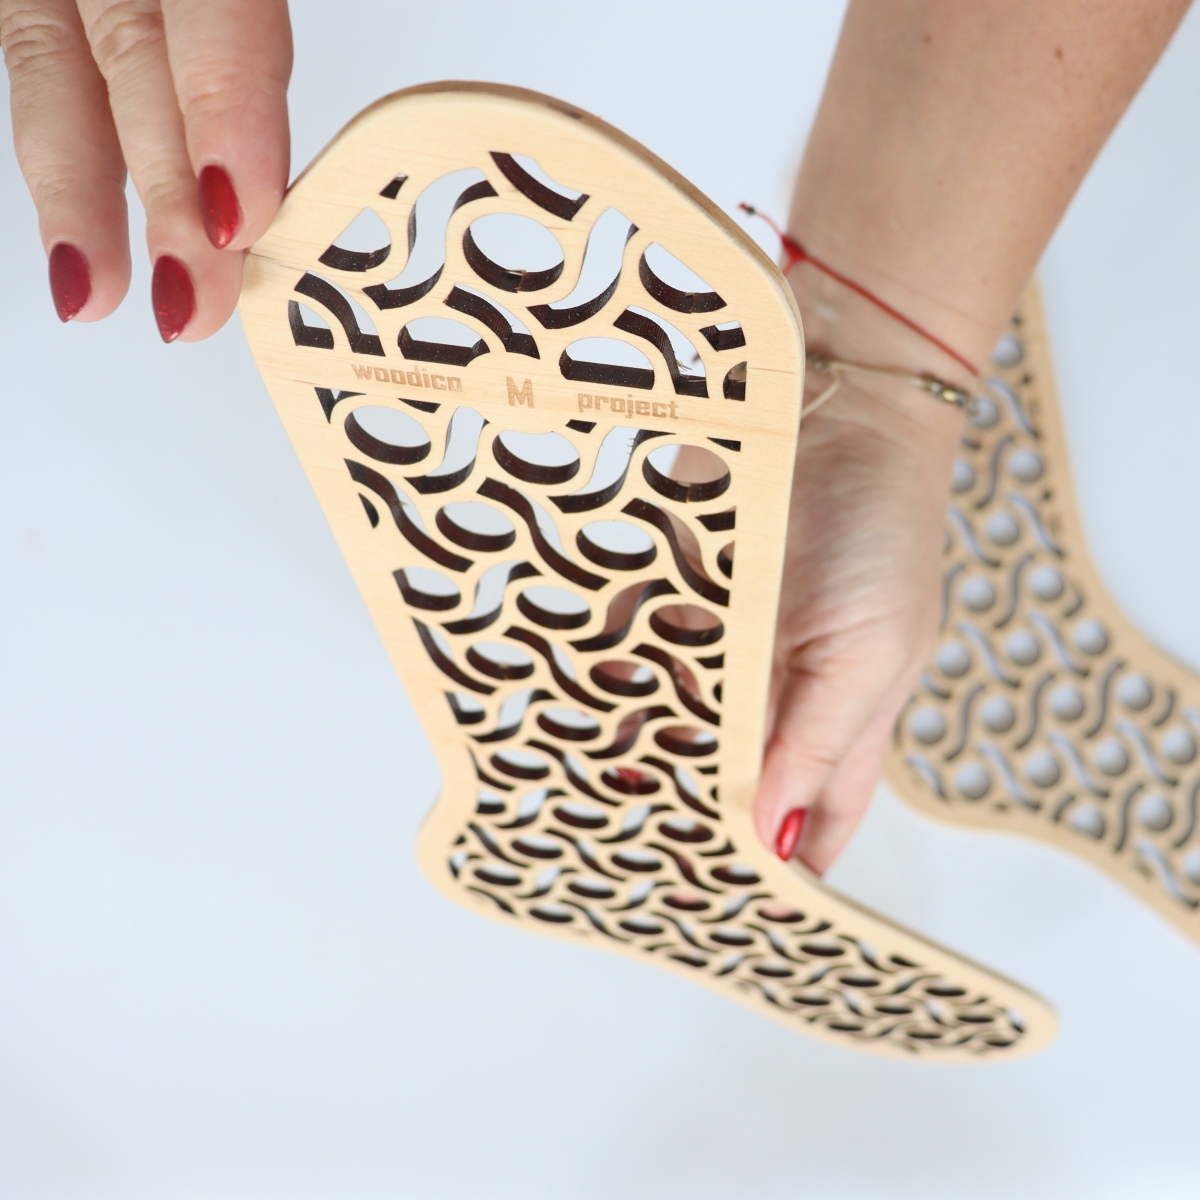 woodico.pro wooden sock blockers pasta 4 1200x1200 - Wooden sock blockers / Pasta